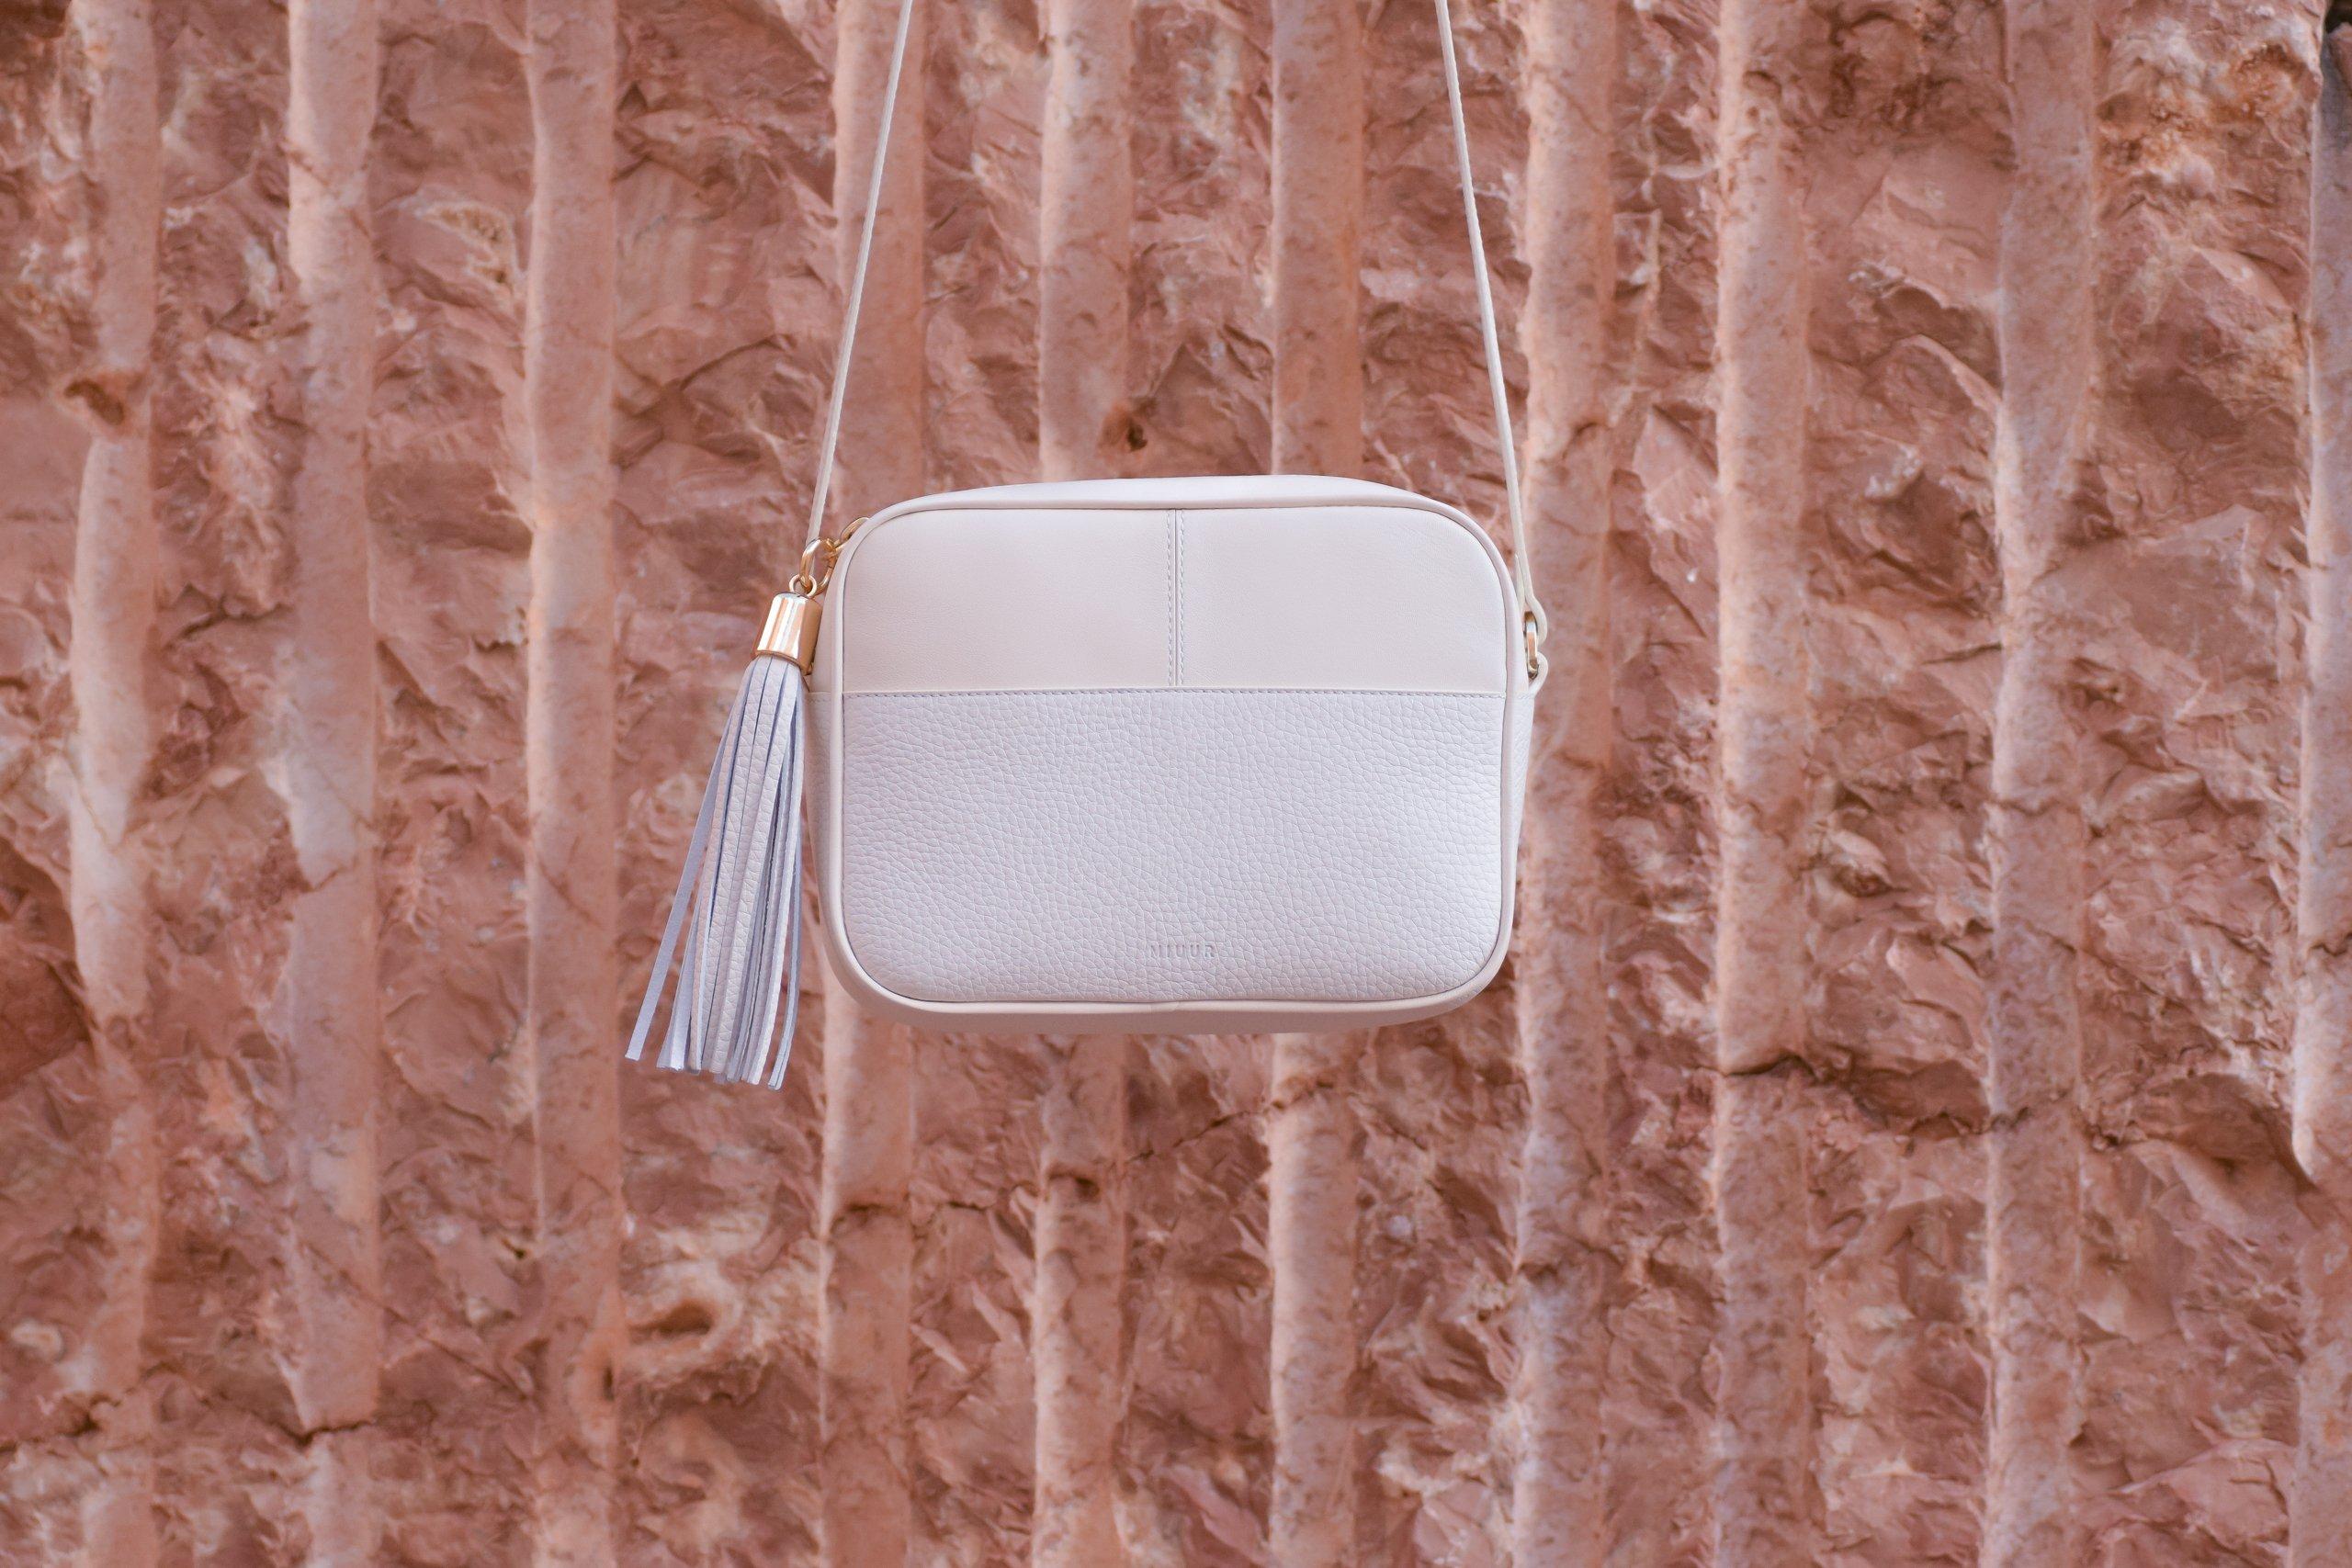 miuur lua ivory white crossbody bag